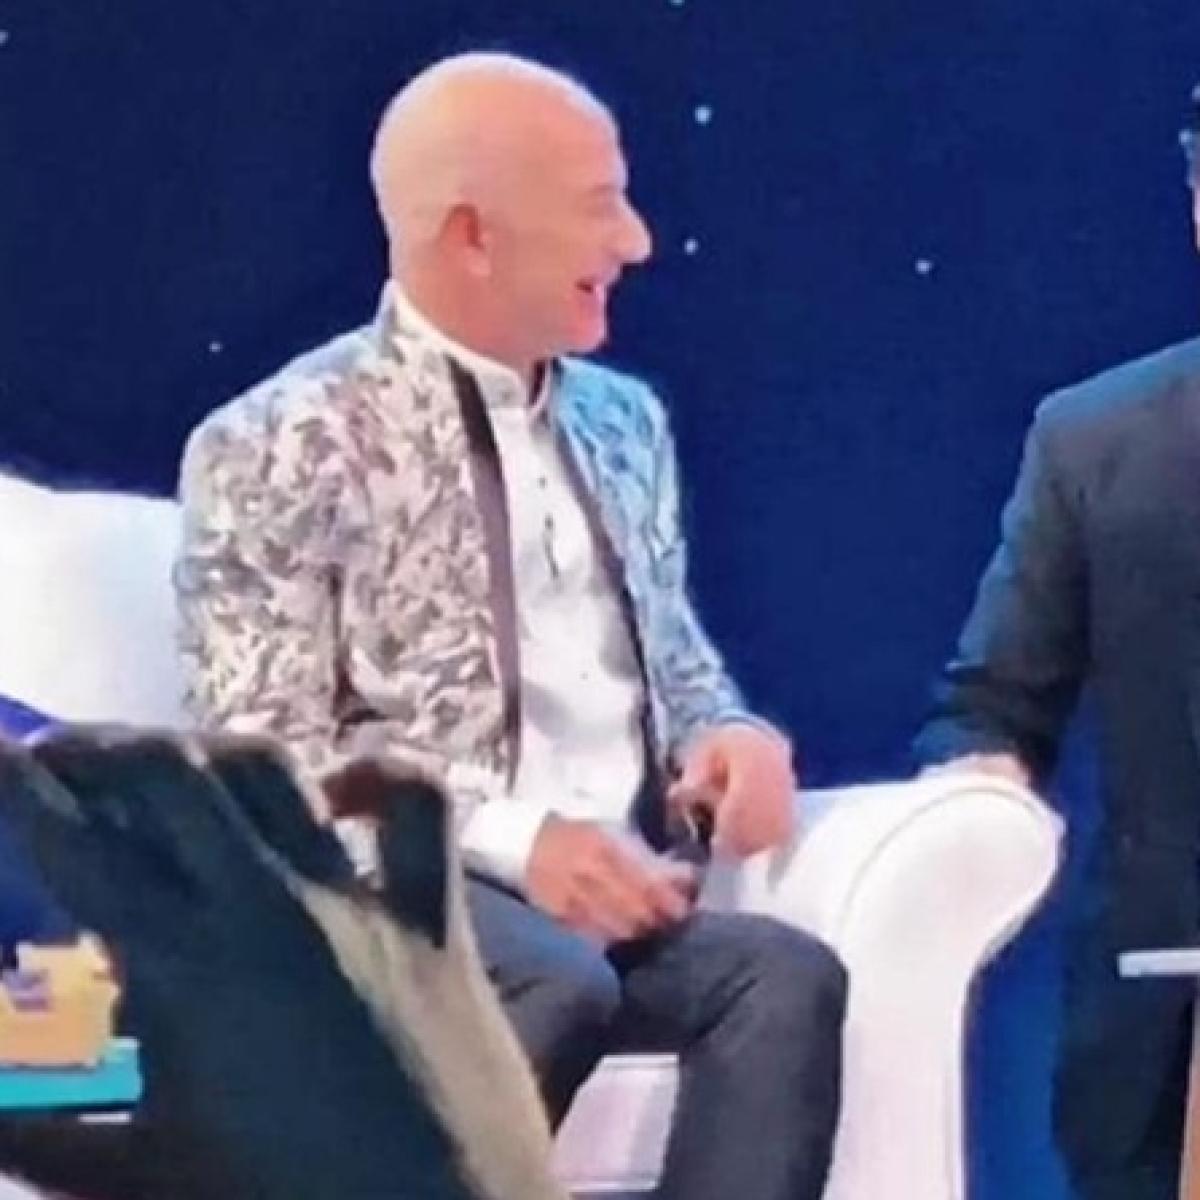 Watch: Shah Rukh Khan makes Amazon  CEO Jeff Bezos say the iconic 'Don' dialogue